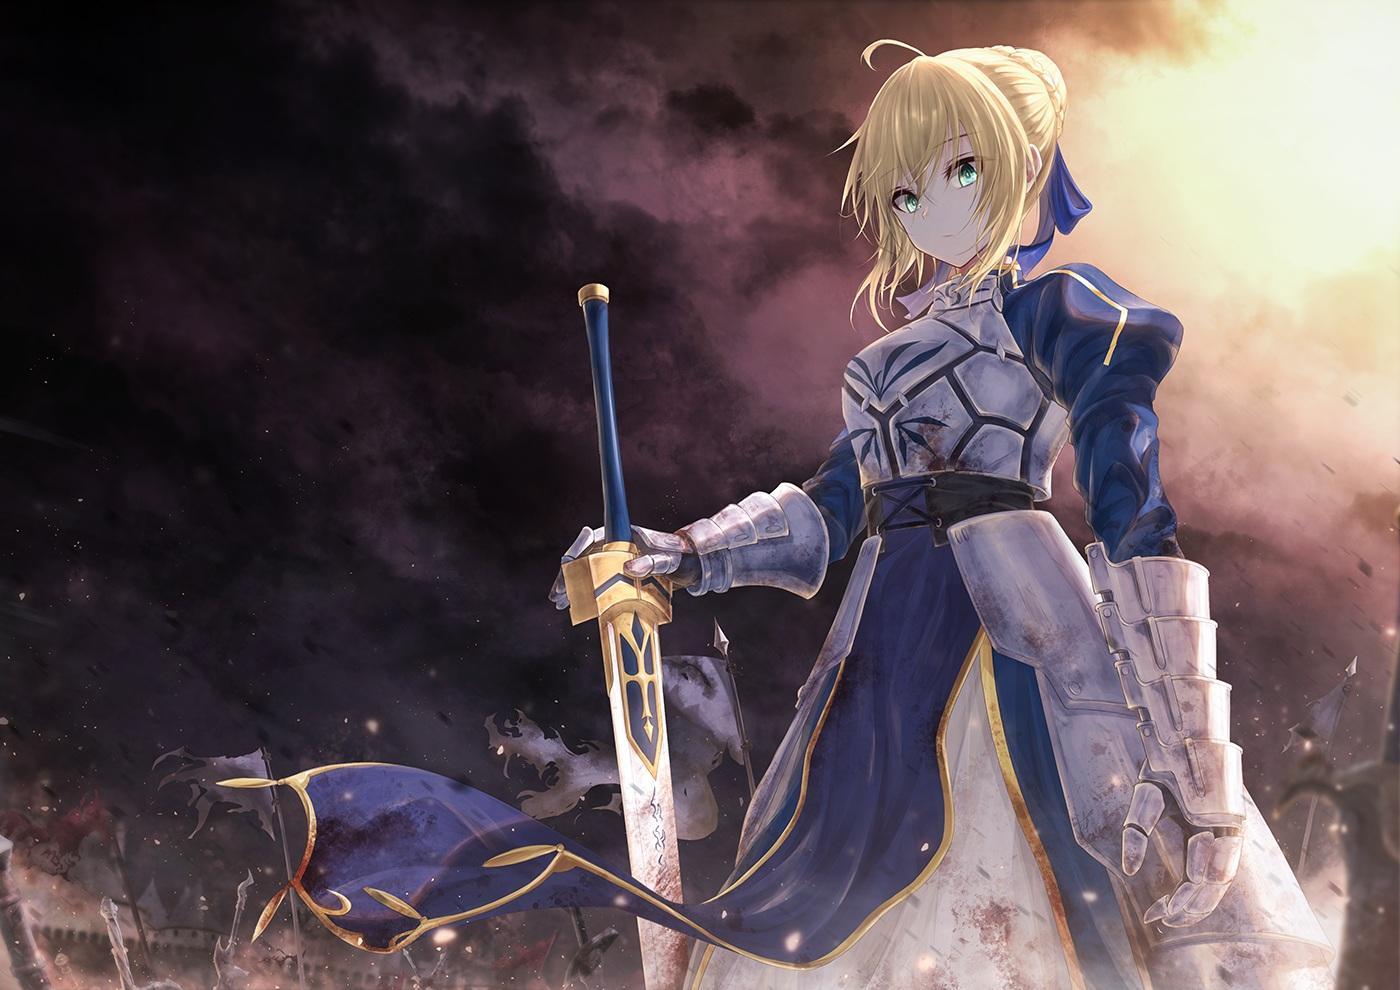 armor artoria_pendragon_(all) blonde_hair boyogo braids clouds dress fate/grand_order fate_(series) green_eyes saber sky sword weapon